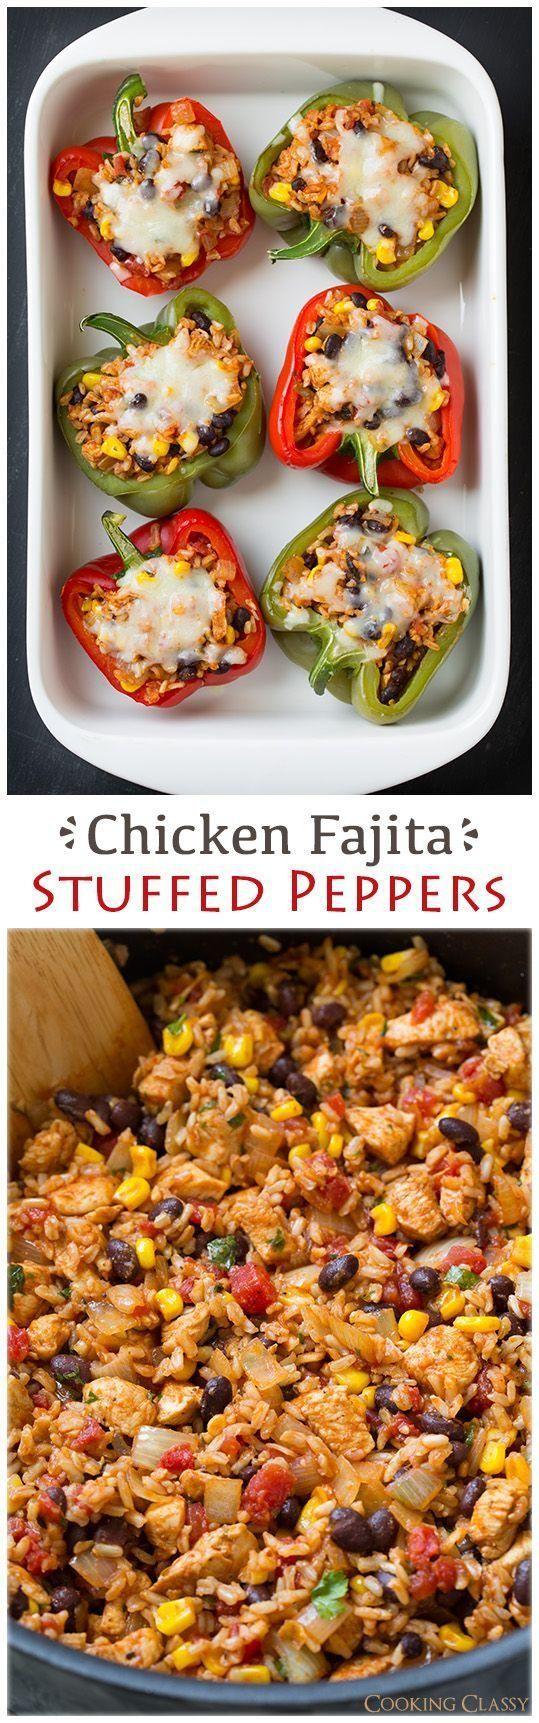 best stuffed pepper recipes images on pinterest stuffed pepper